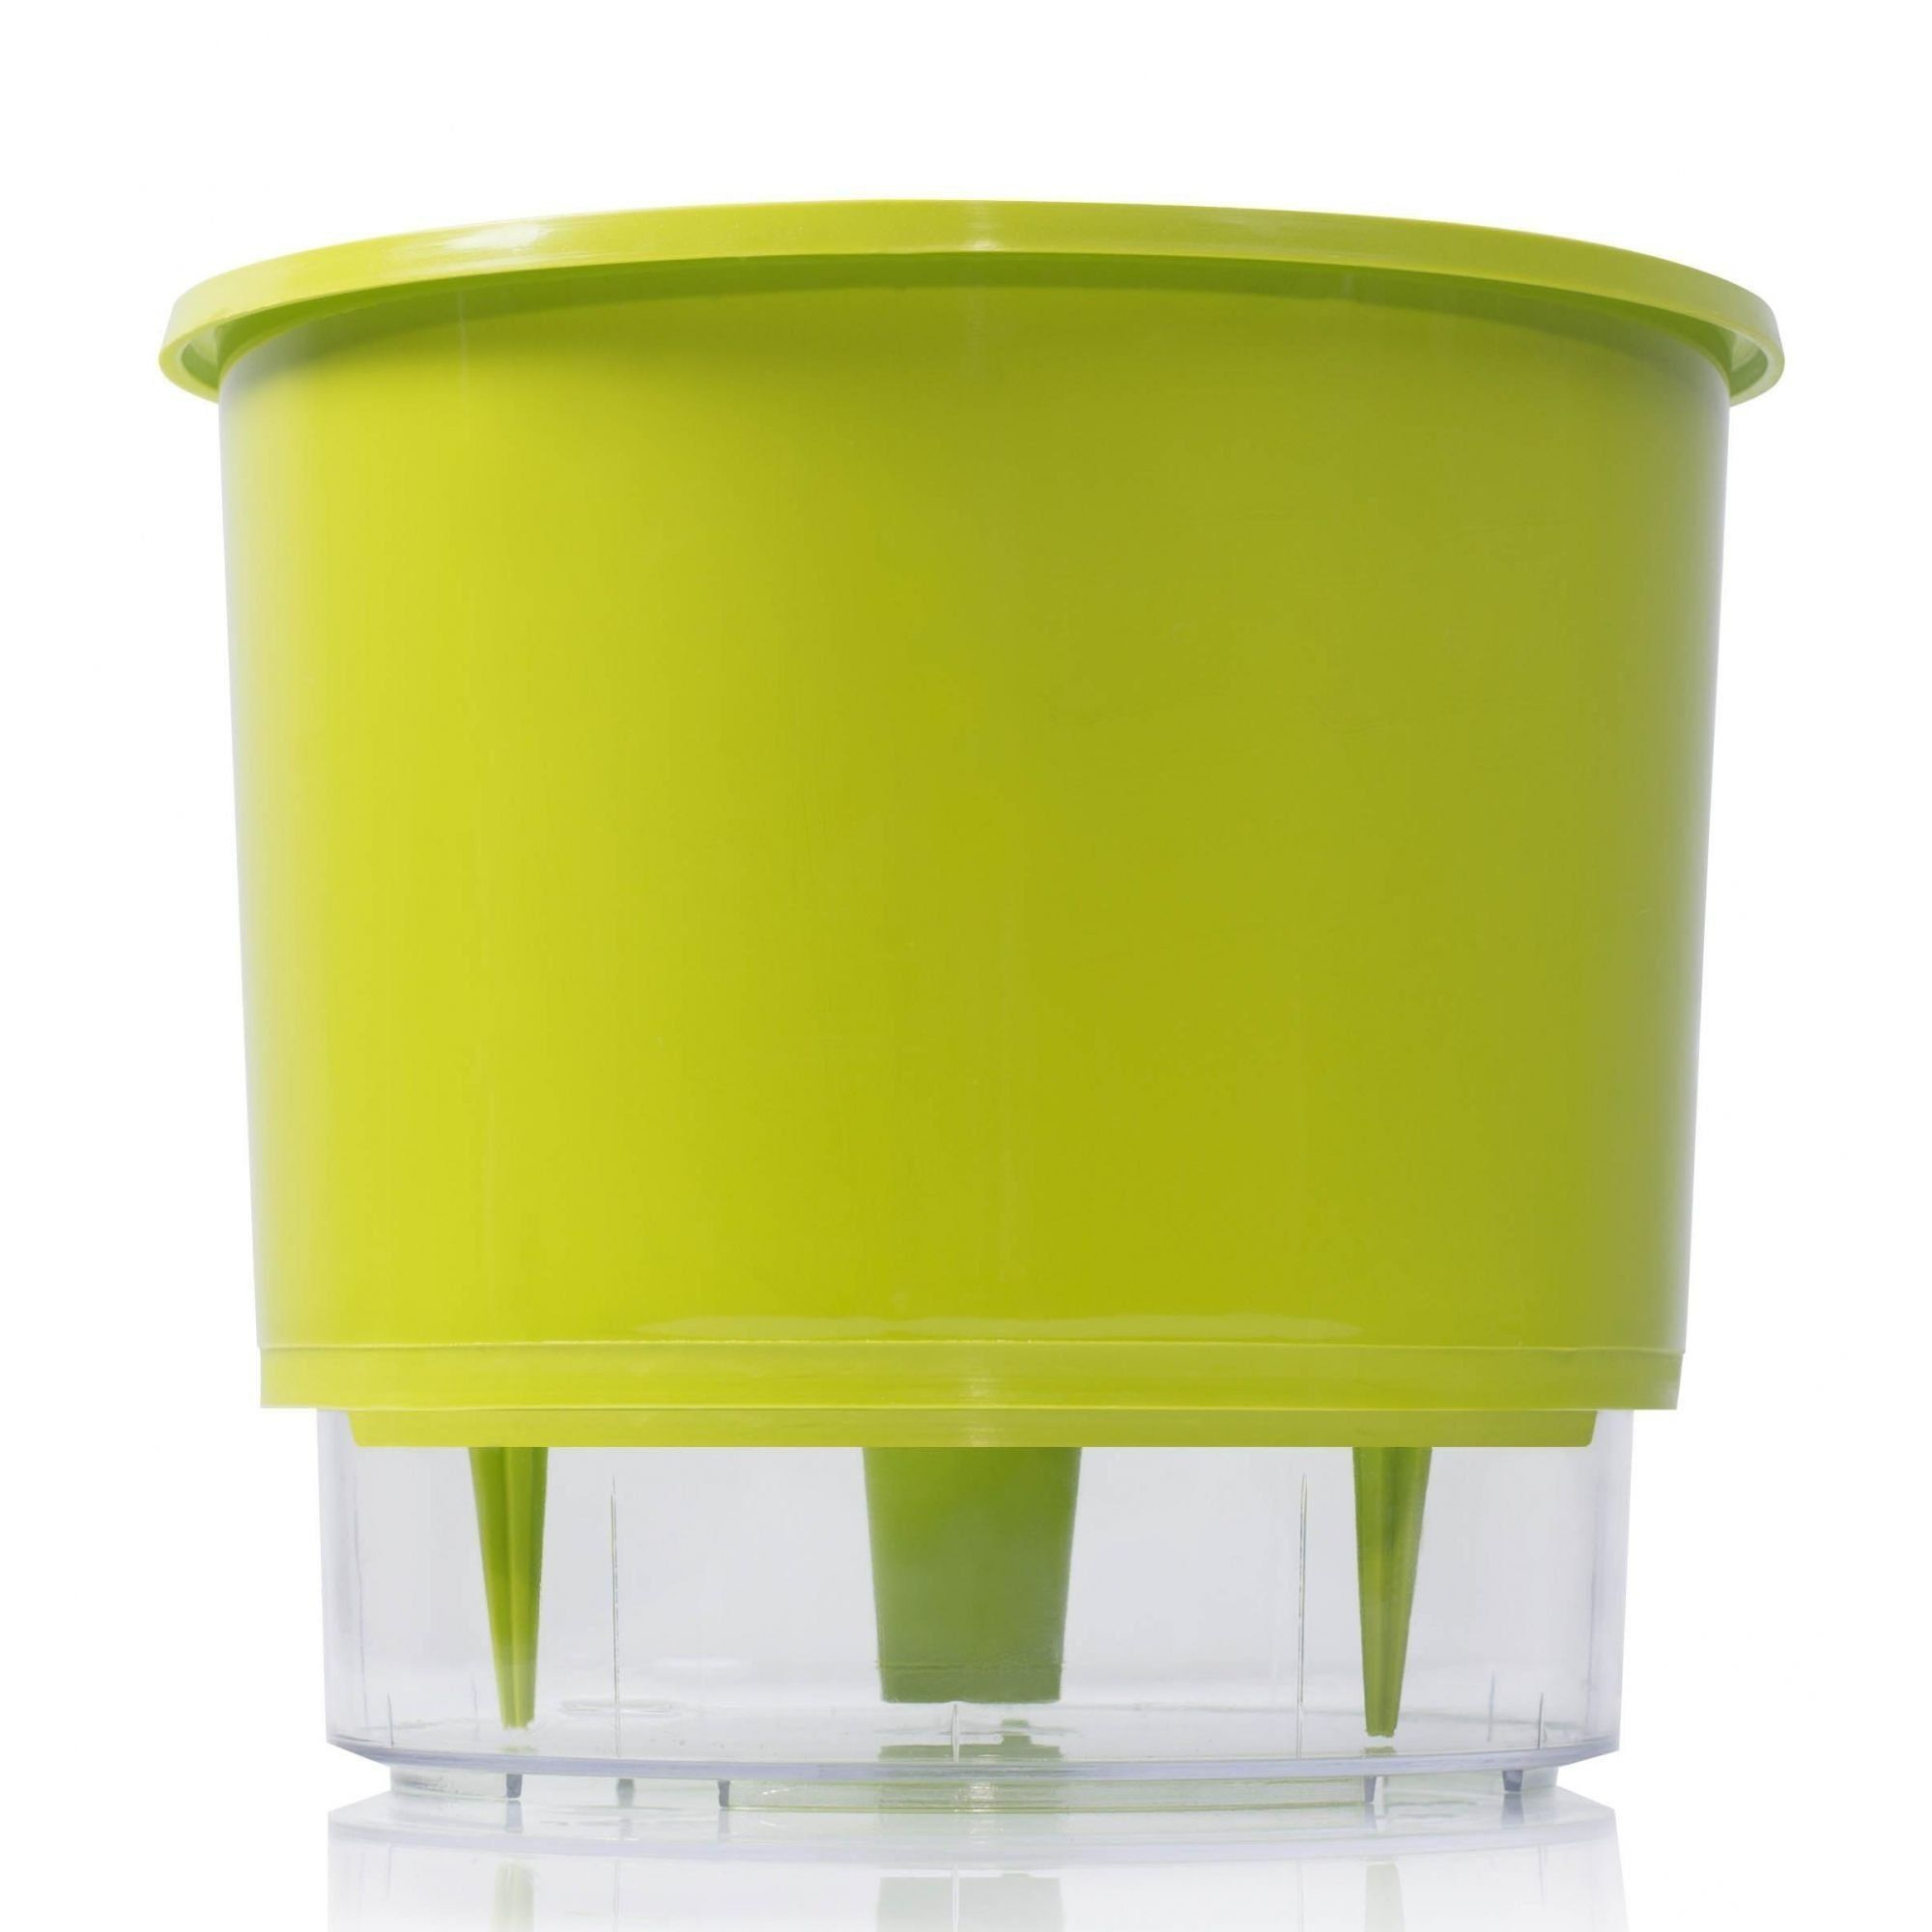 Vaso Autoirrigável Verde Claro Médio 16cm x 14cm N03  - Vasos Raiz Loja Oficial